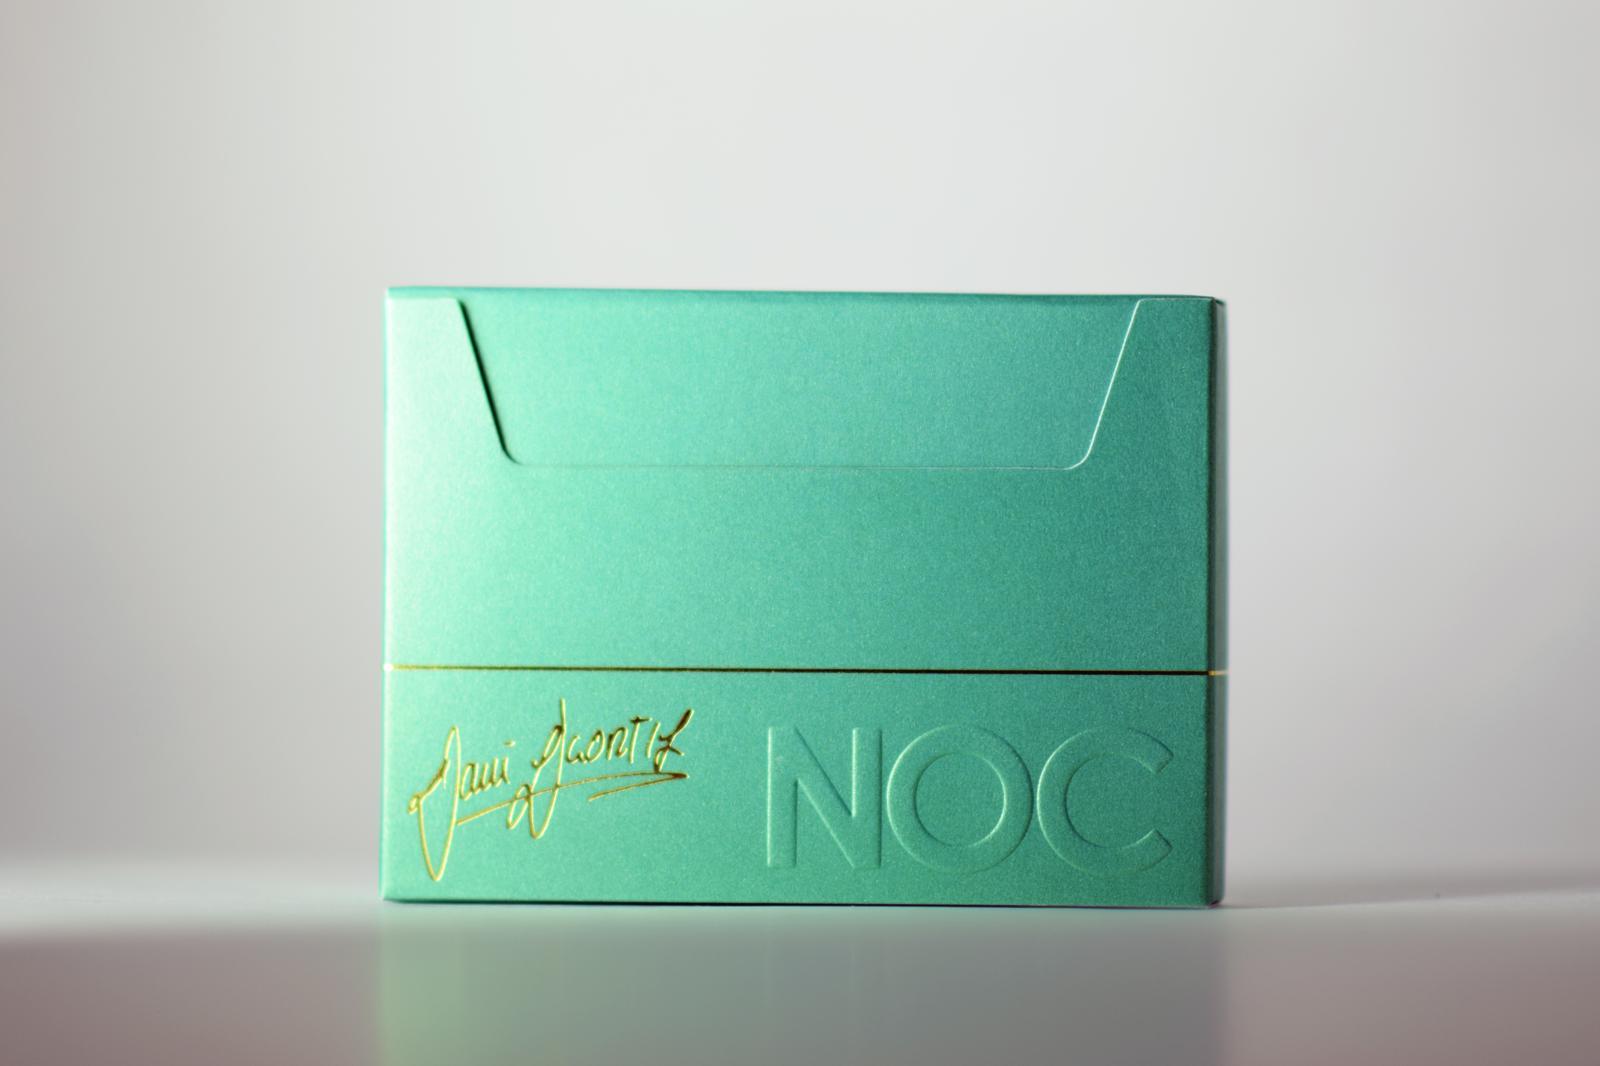 NocDaniFront